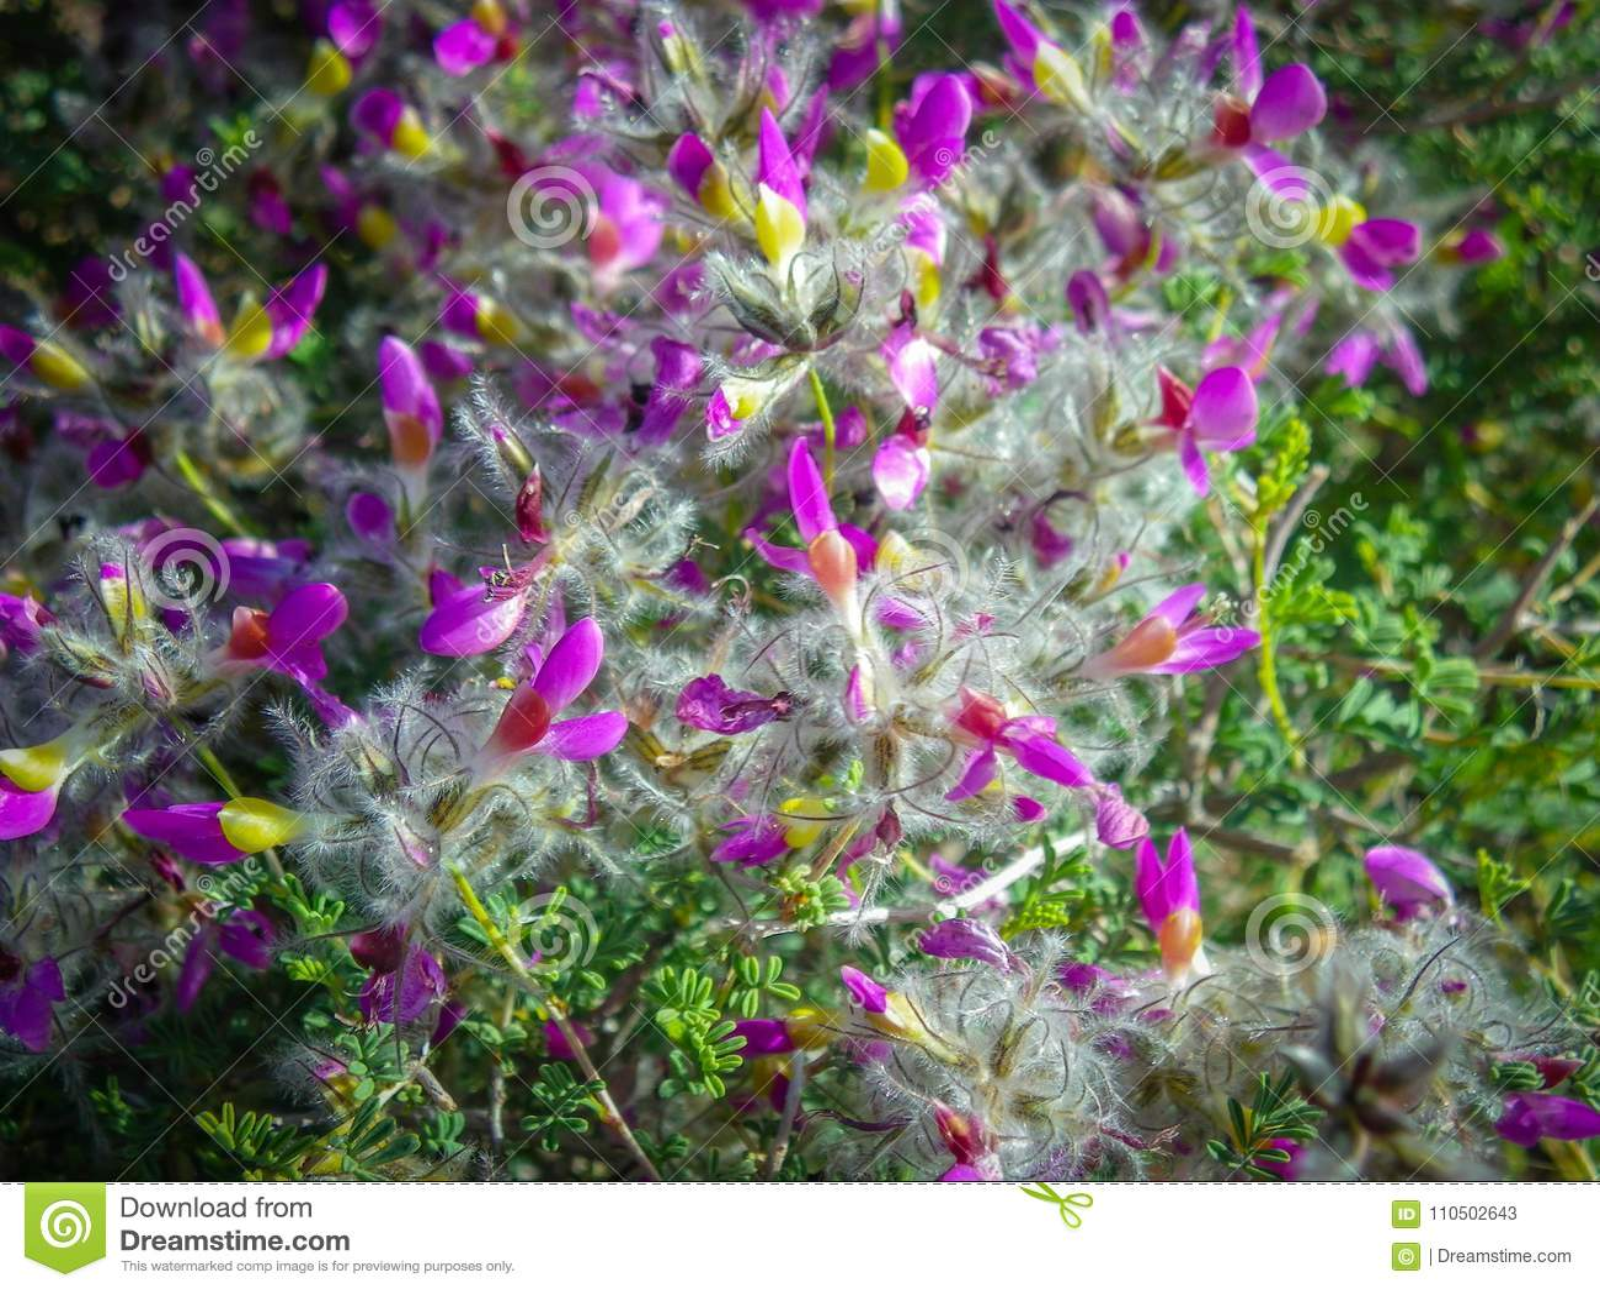 Pretty little purple flowers with yellow center stock image image download pretty little purple flowers with yellow center stock image image of yellow beautiful mightylinksfo